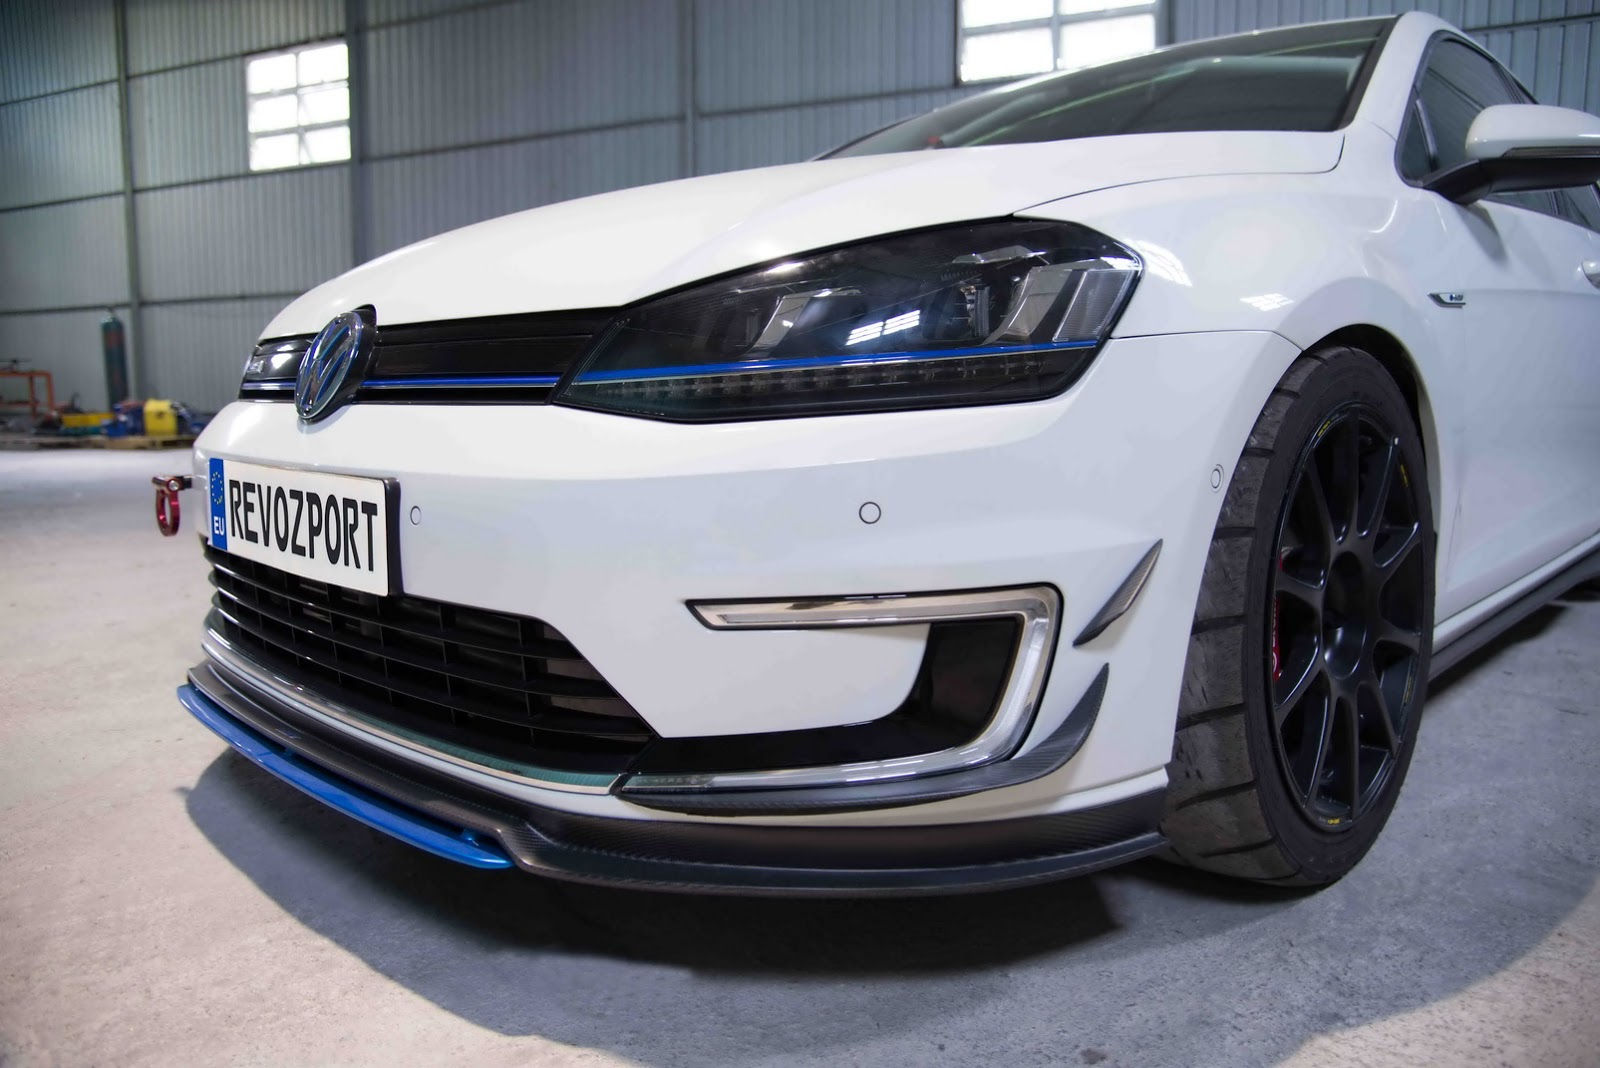 Volkswagen_e-Golf_Razor_7E_by_RevoZport_06